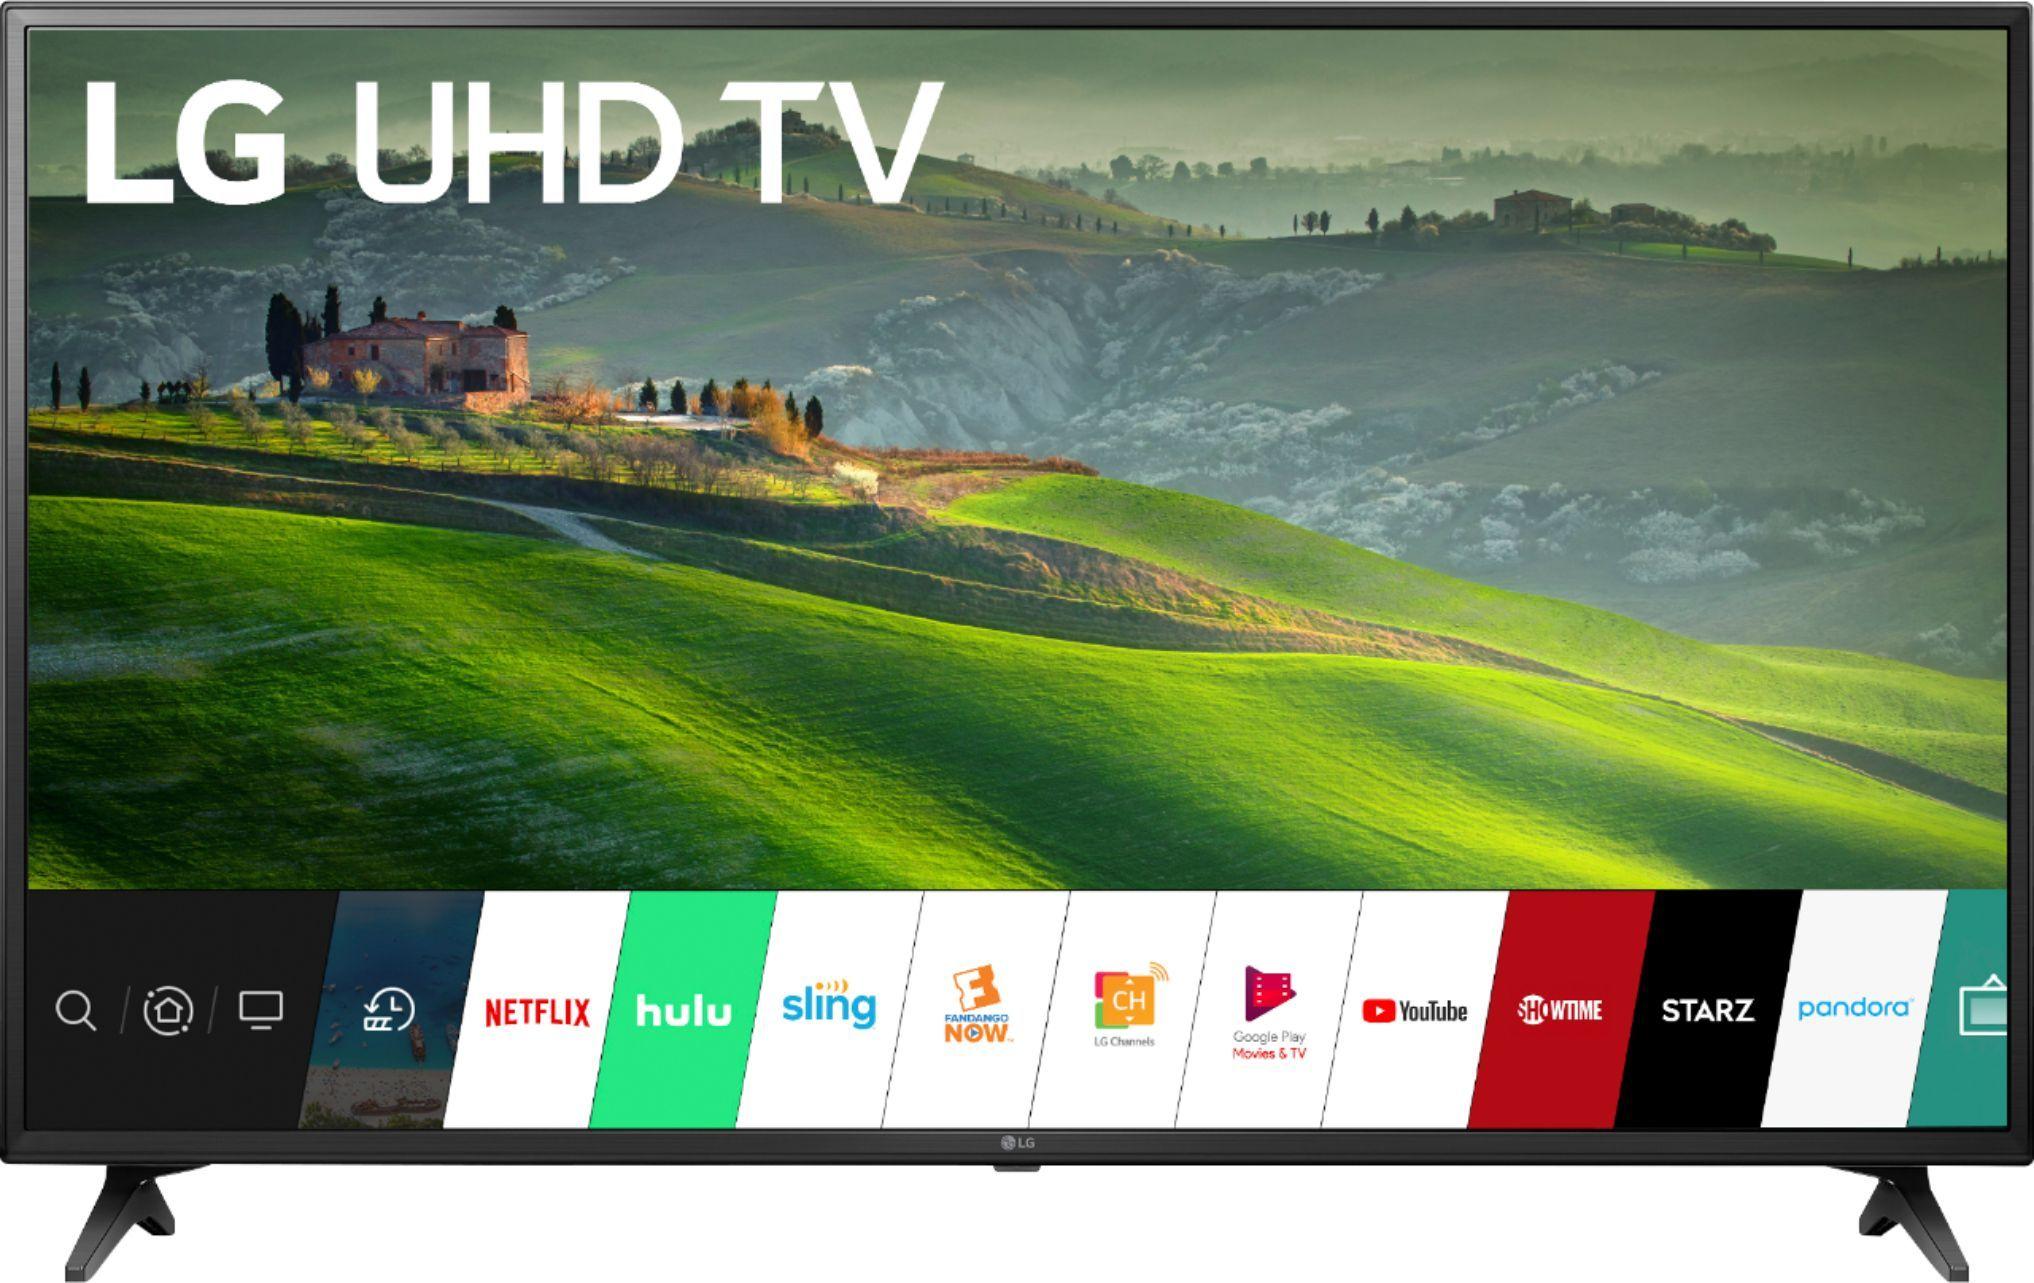 56e4ed866d88922238e97b535f148cdc - How To Get Google Play Store On Lg Tv